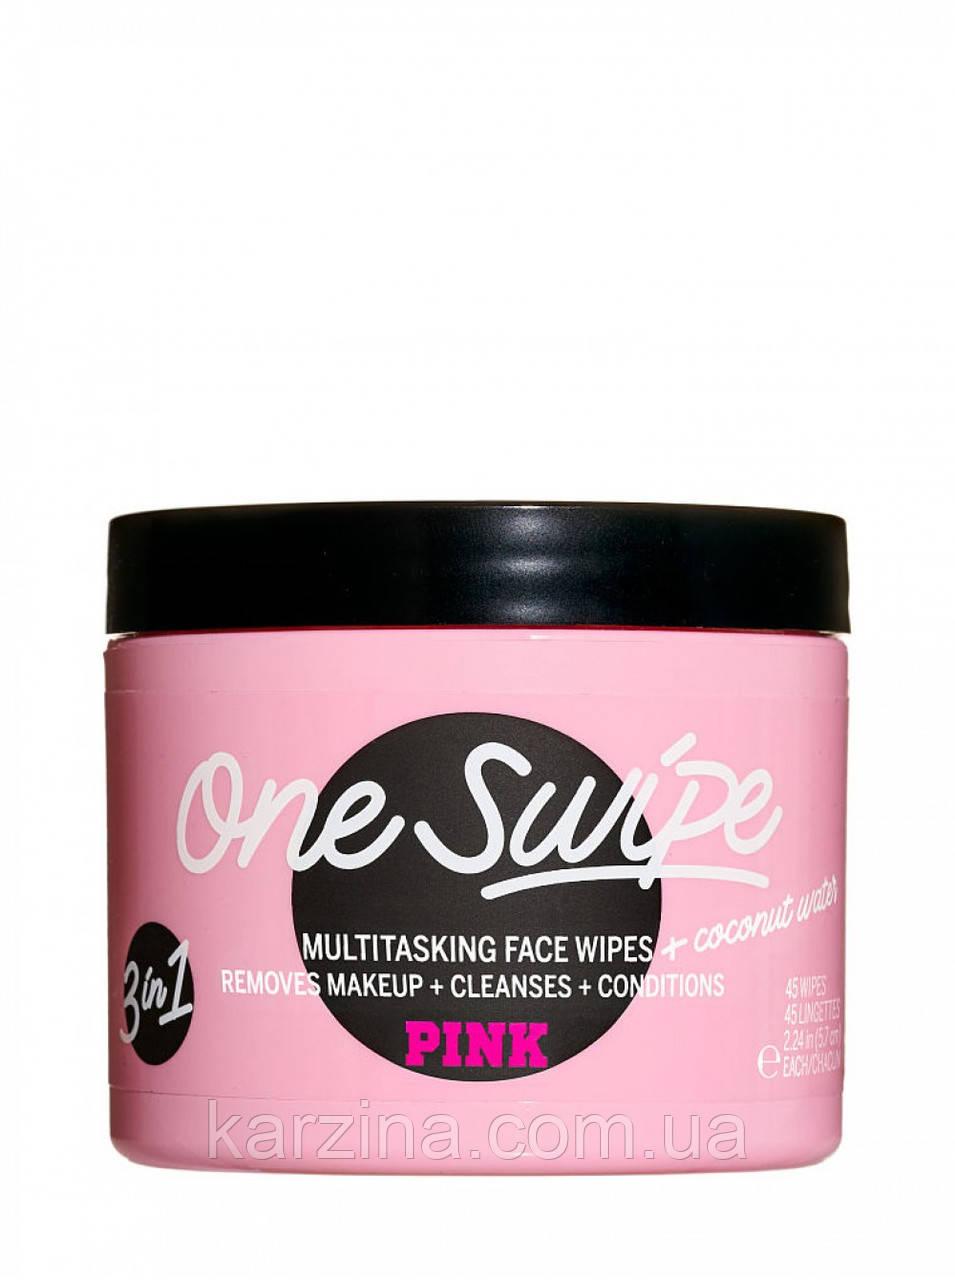 Универсальные салфетки для лица Victoria's Secret One Swipe Multi-tasking Face Wipes